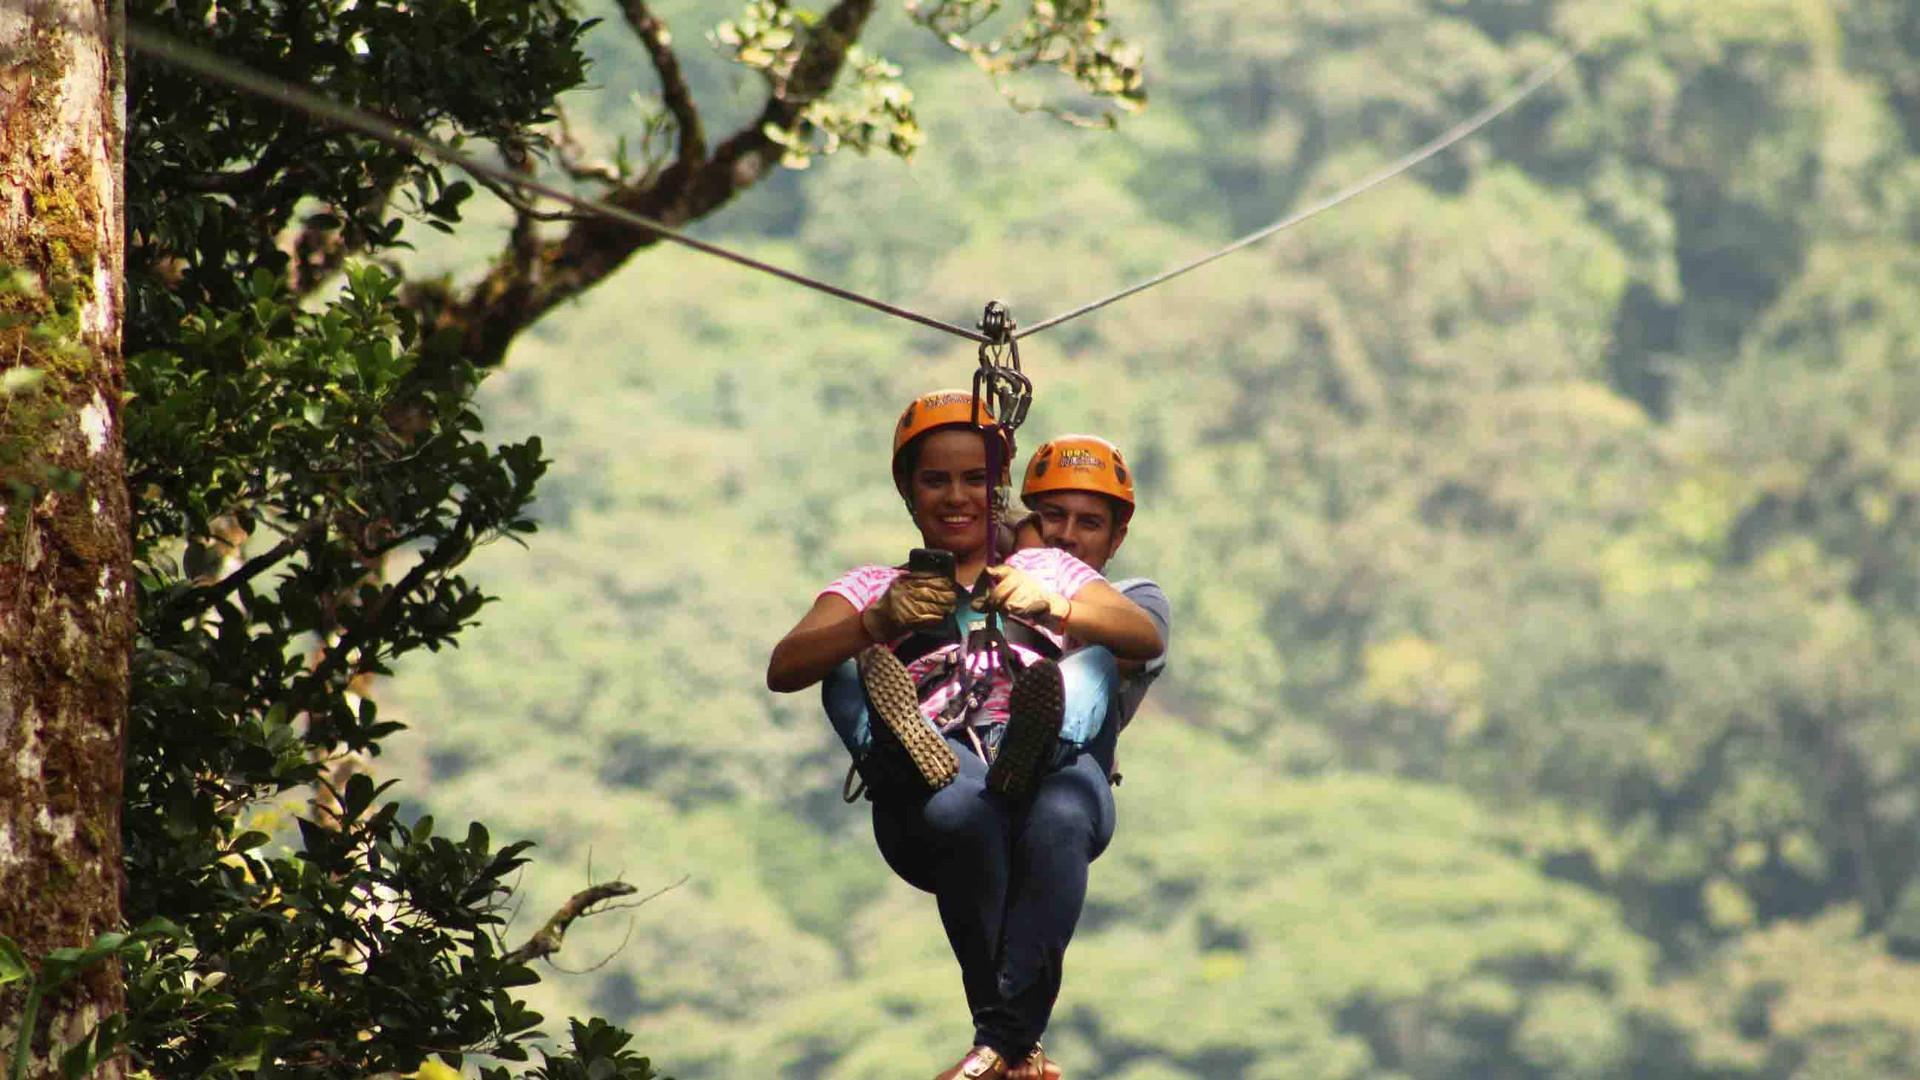 Monteverde Costa Rica zipline adventure guests zipping tandem through lush nature.